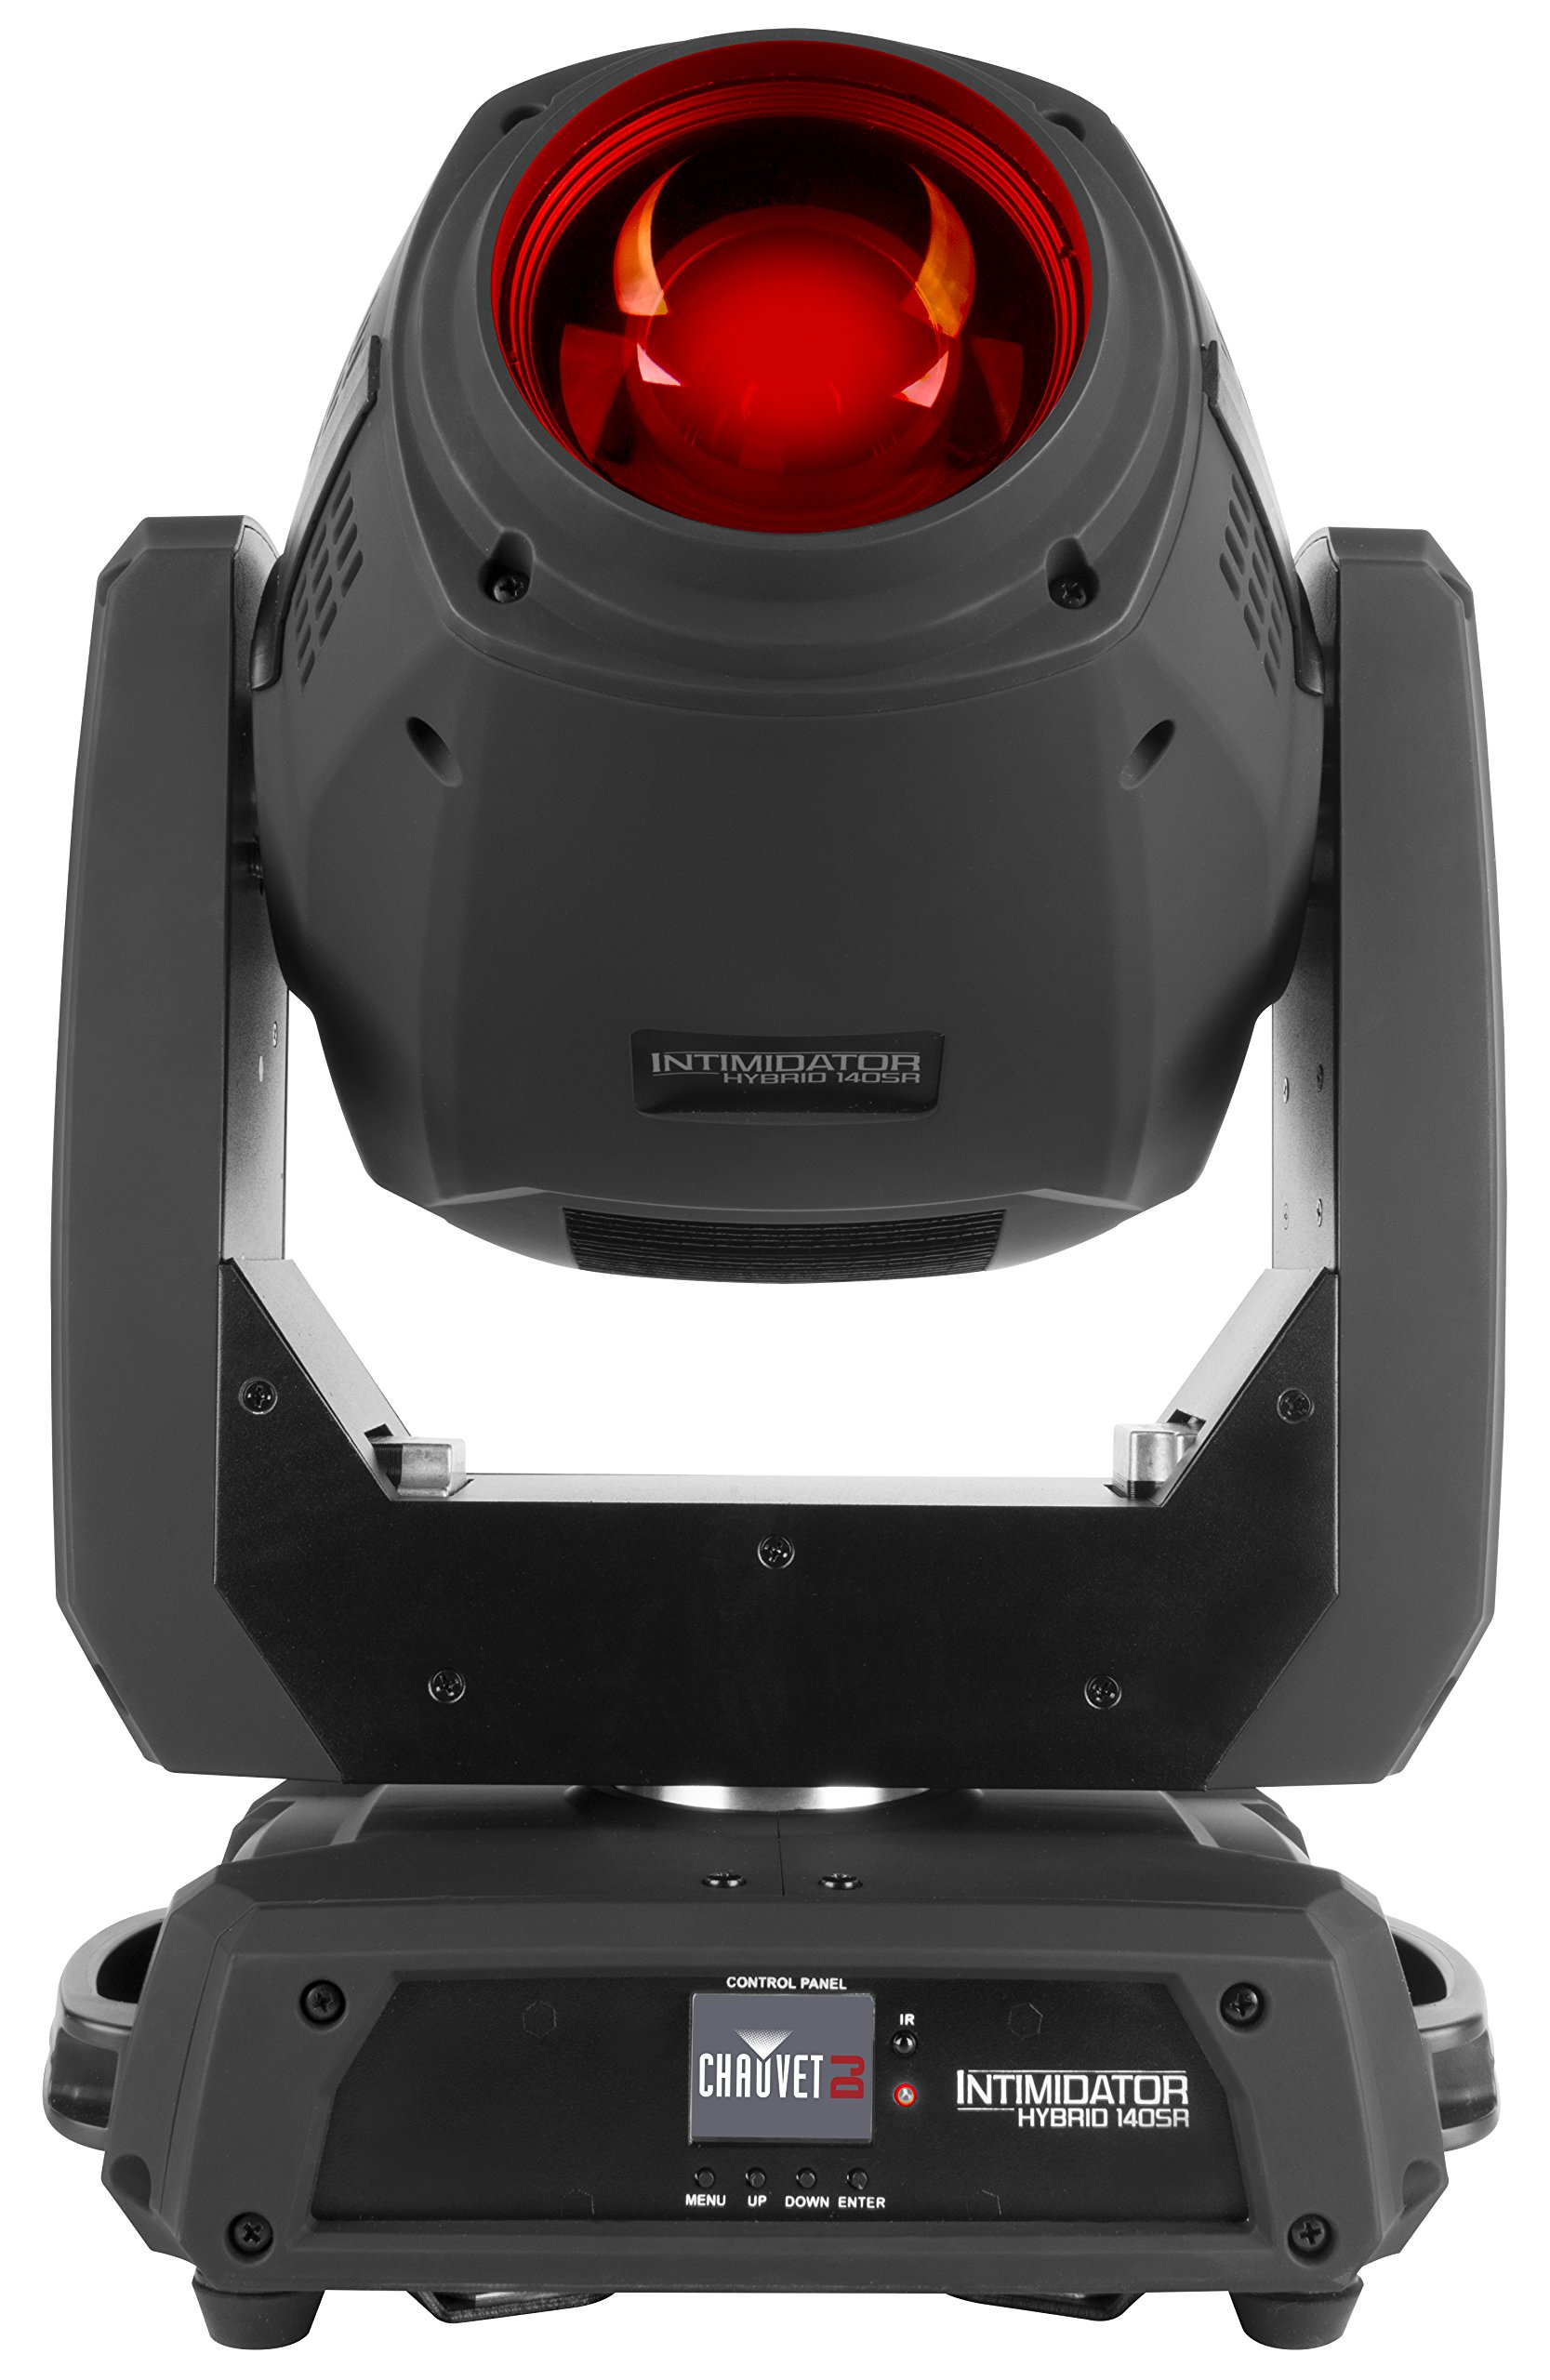 CHAUVET DJ Intimidator Hybrid 140SR LED Moving Head Effect Light | Stage Lights